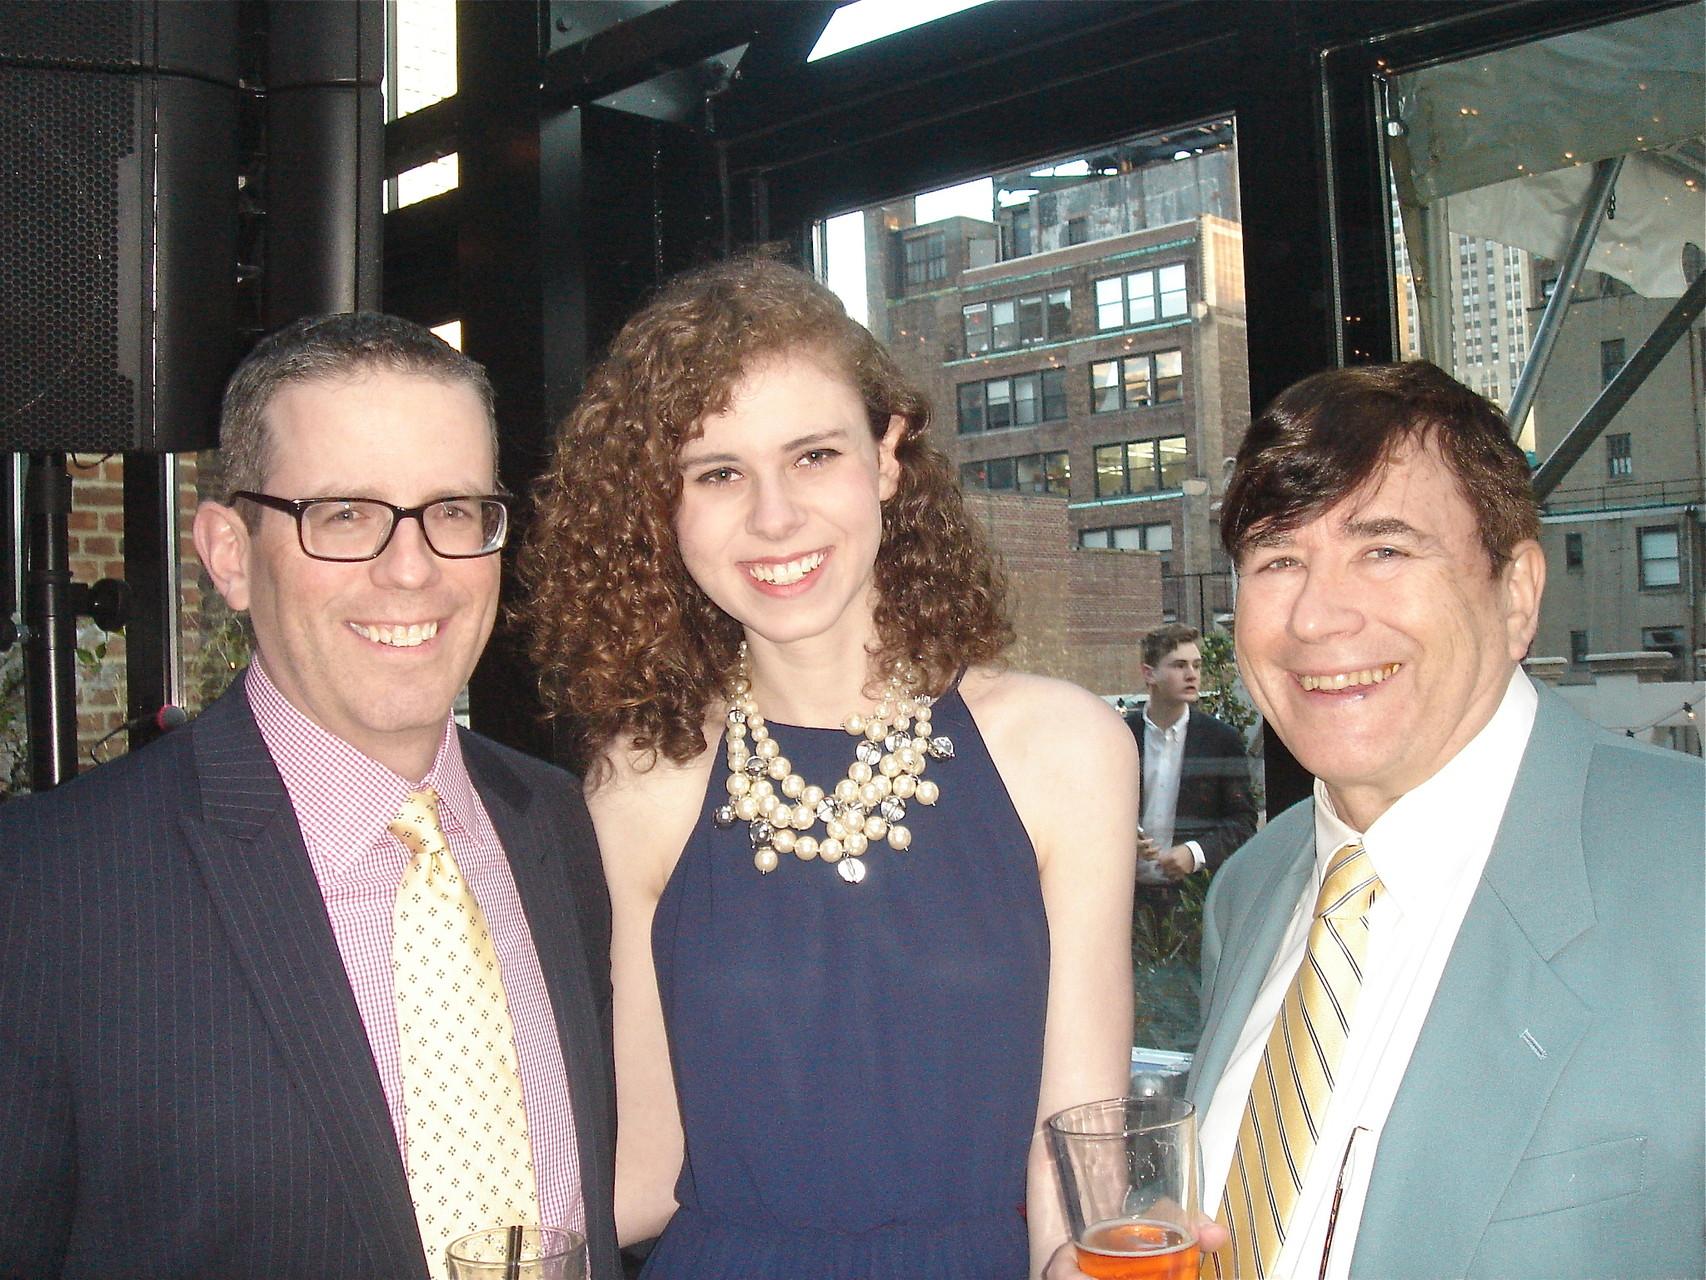 Josh, Erin Kagel, John Wagner